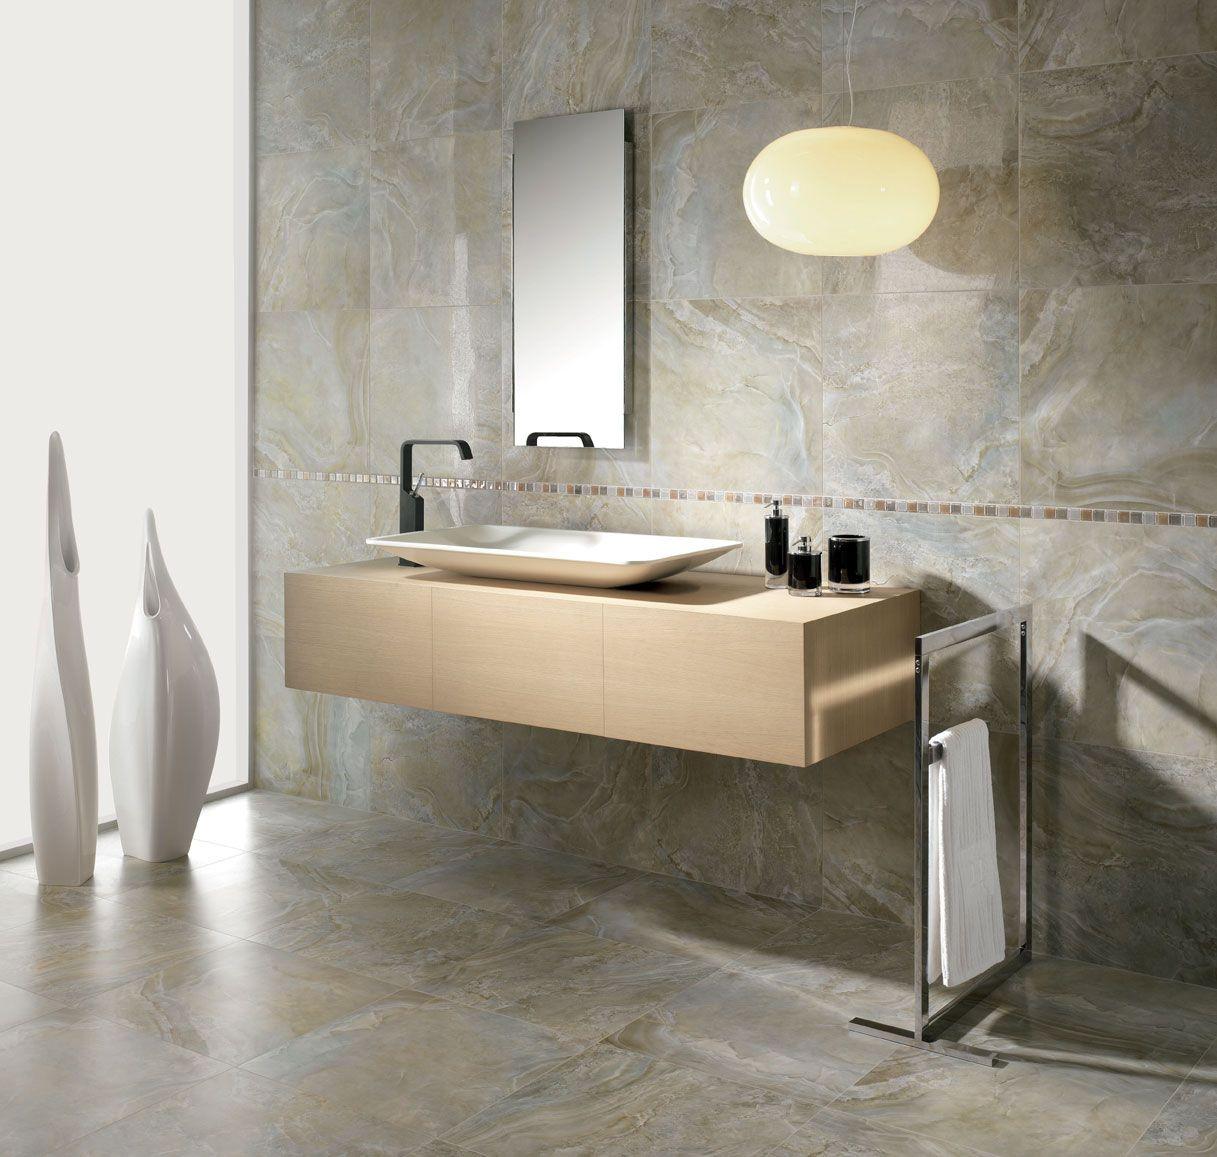 A1 Luxury Bathrooms & Kitchens how to get a classic bathroom interior design | room decor ideas